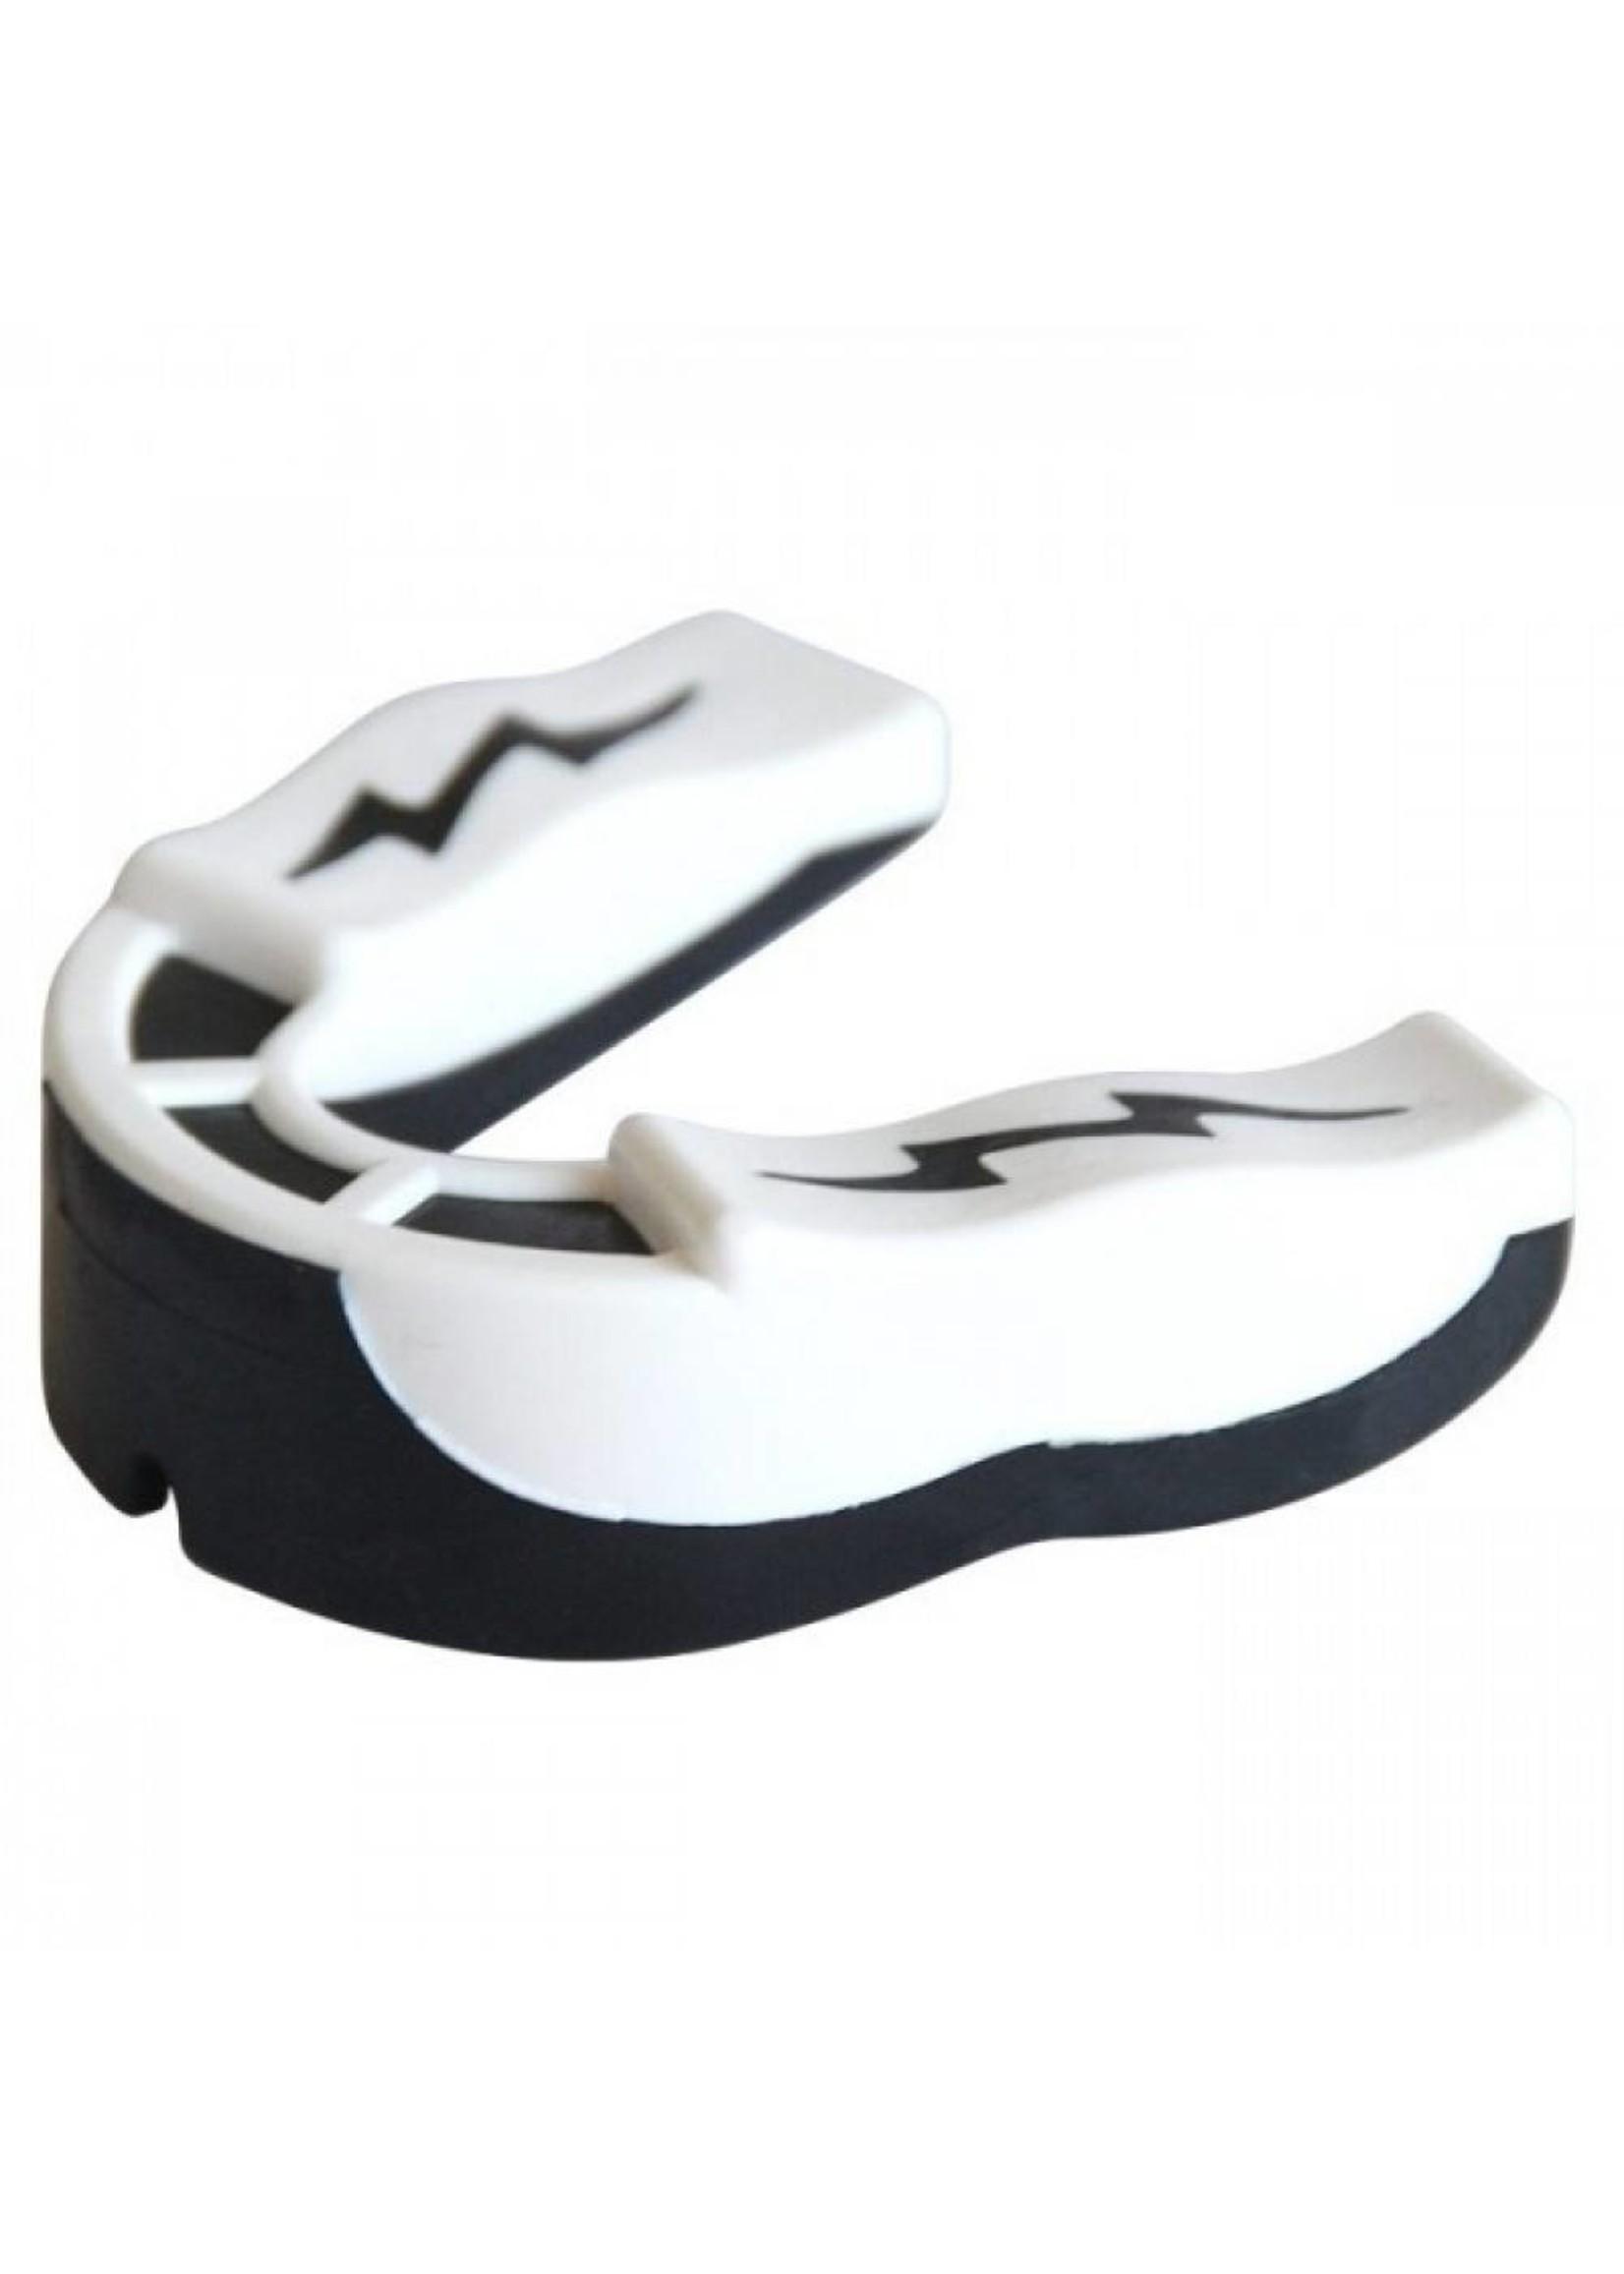 Shockdoctor Shock Doctor 1.5V Strapless Mouth Guard White/Black Junior